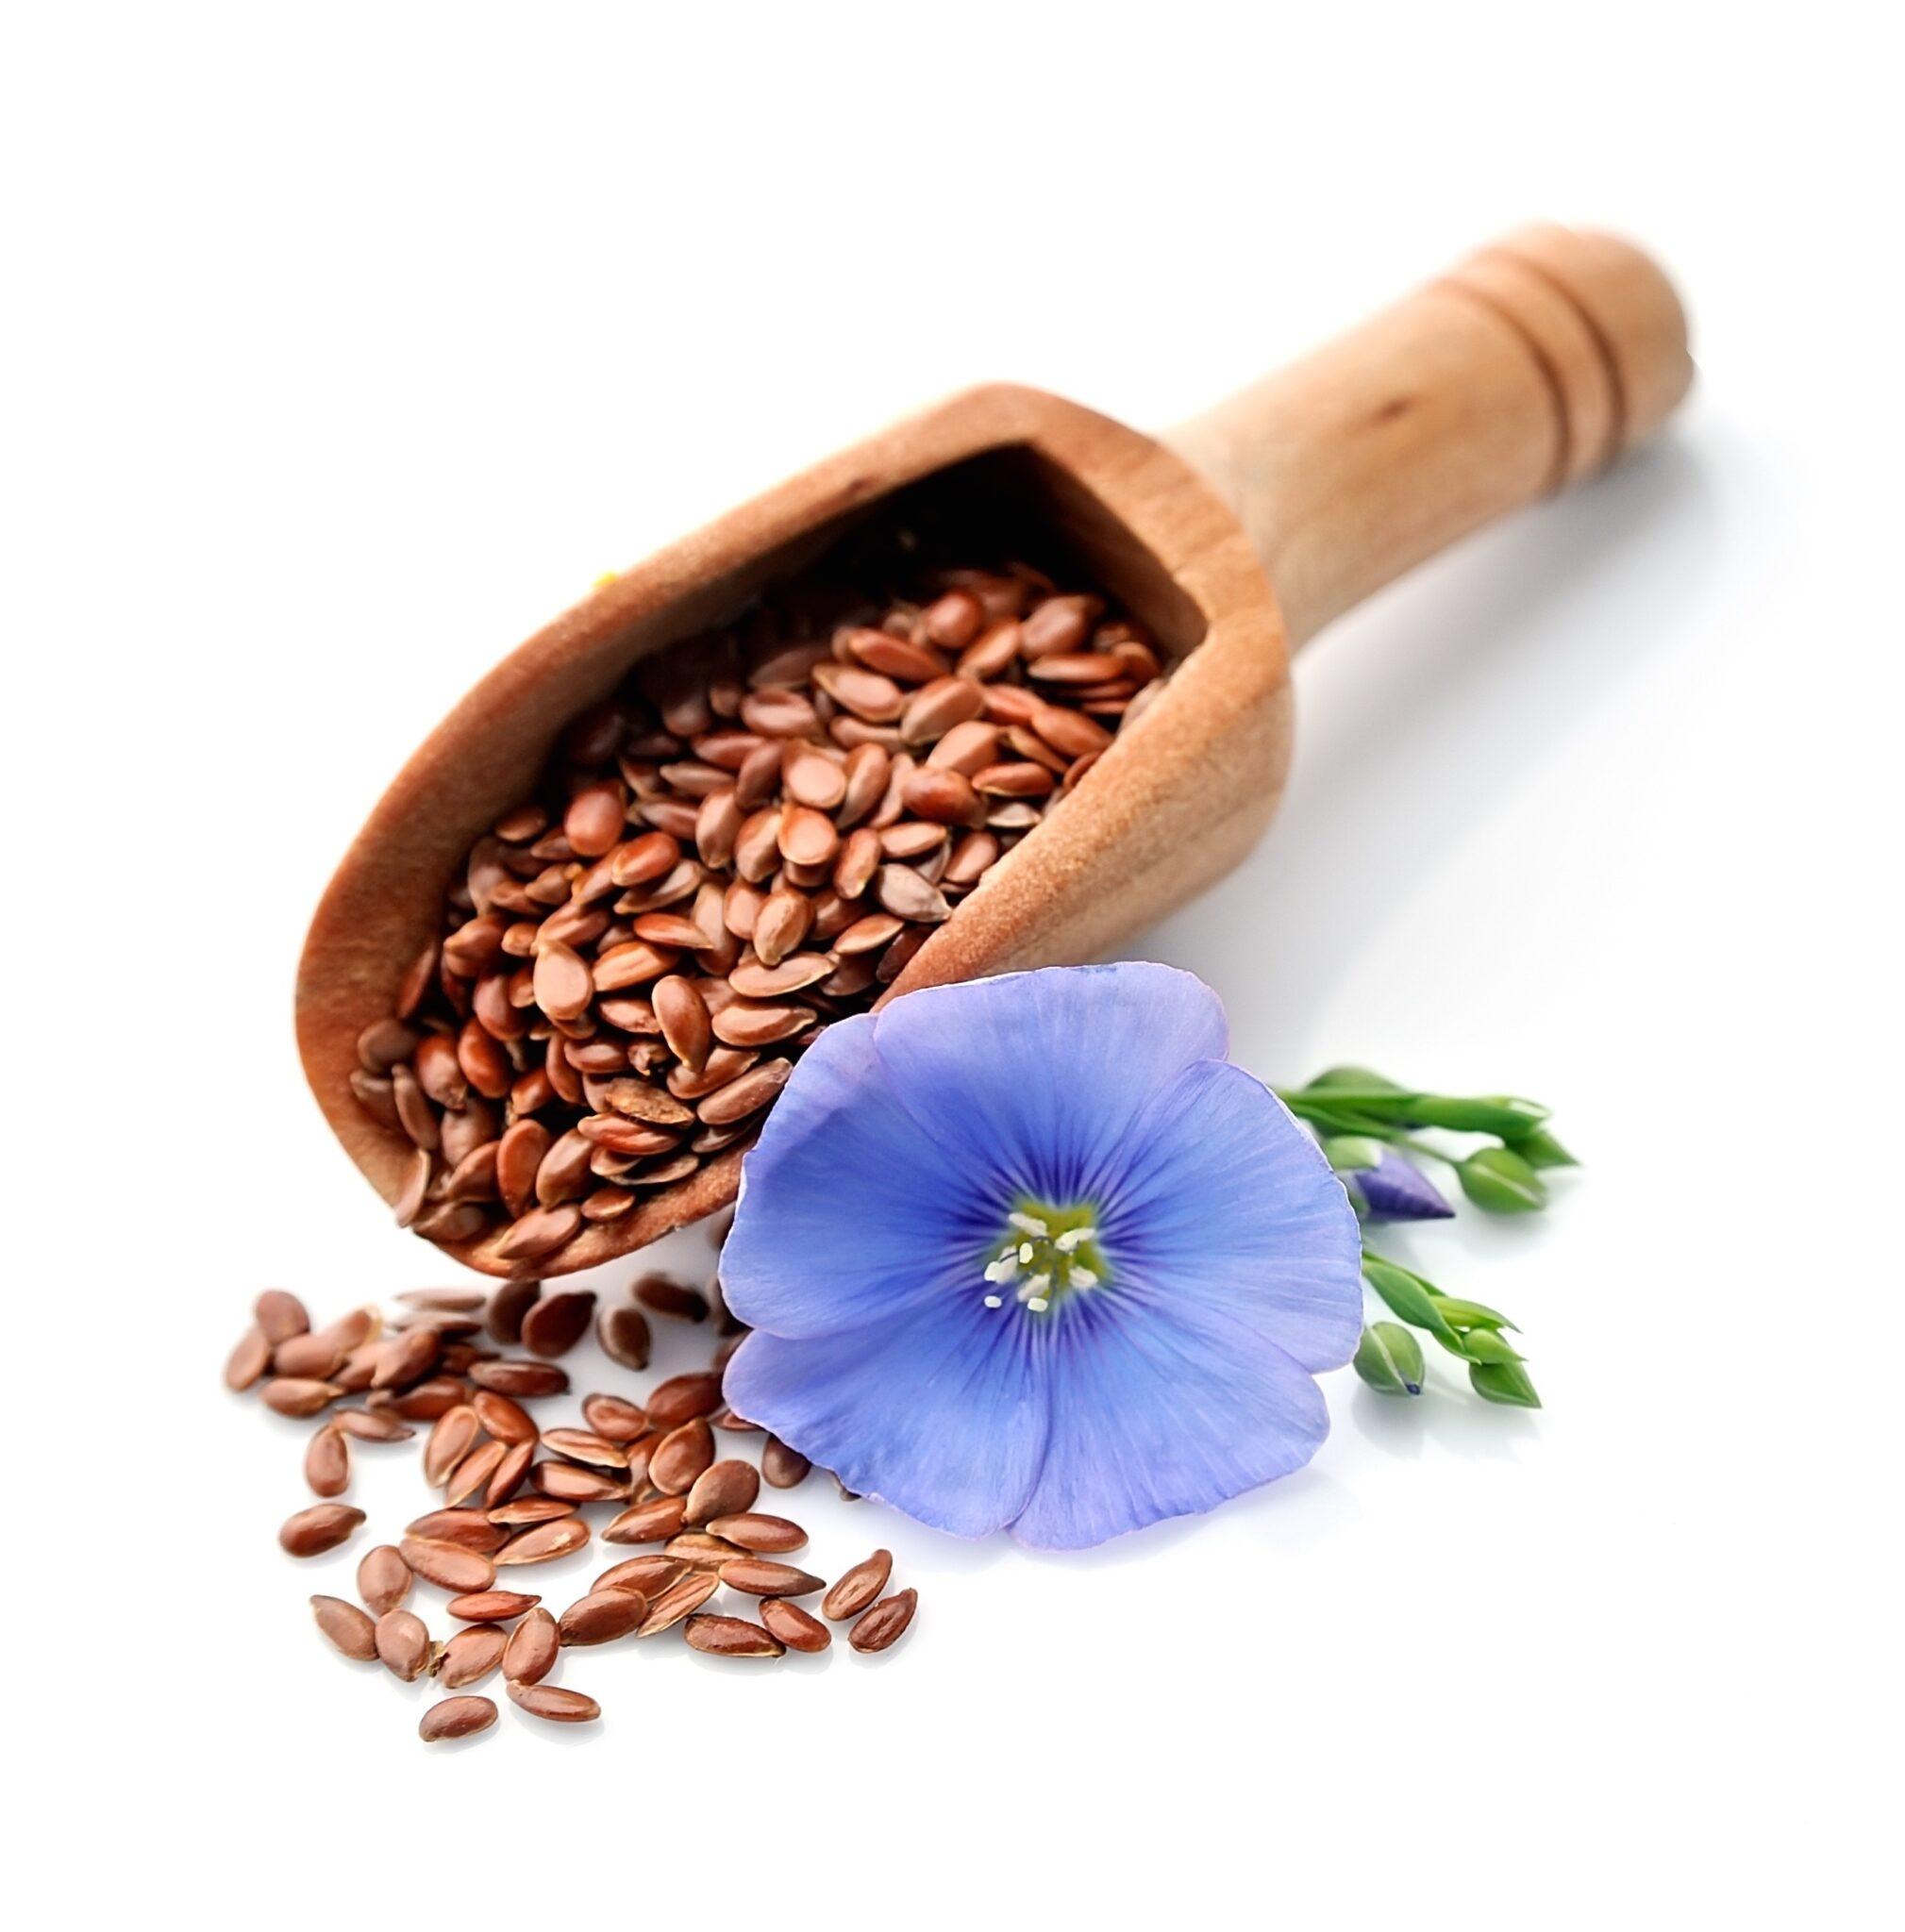 Flaxseed benefits